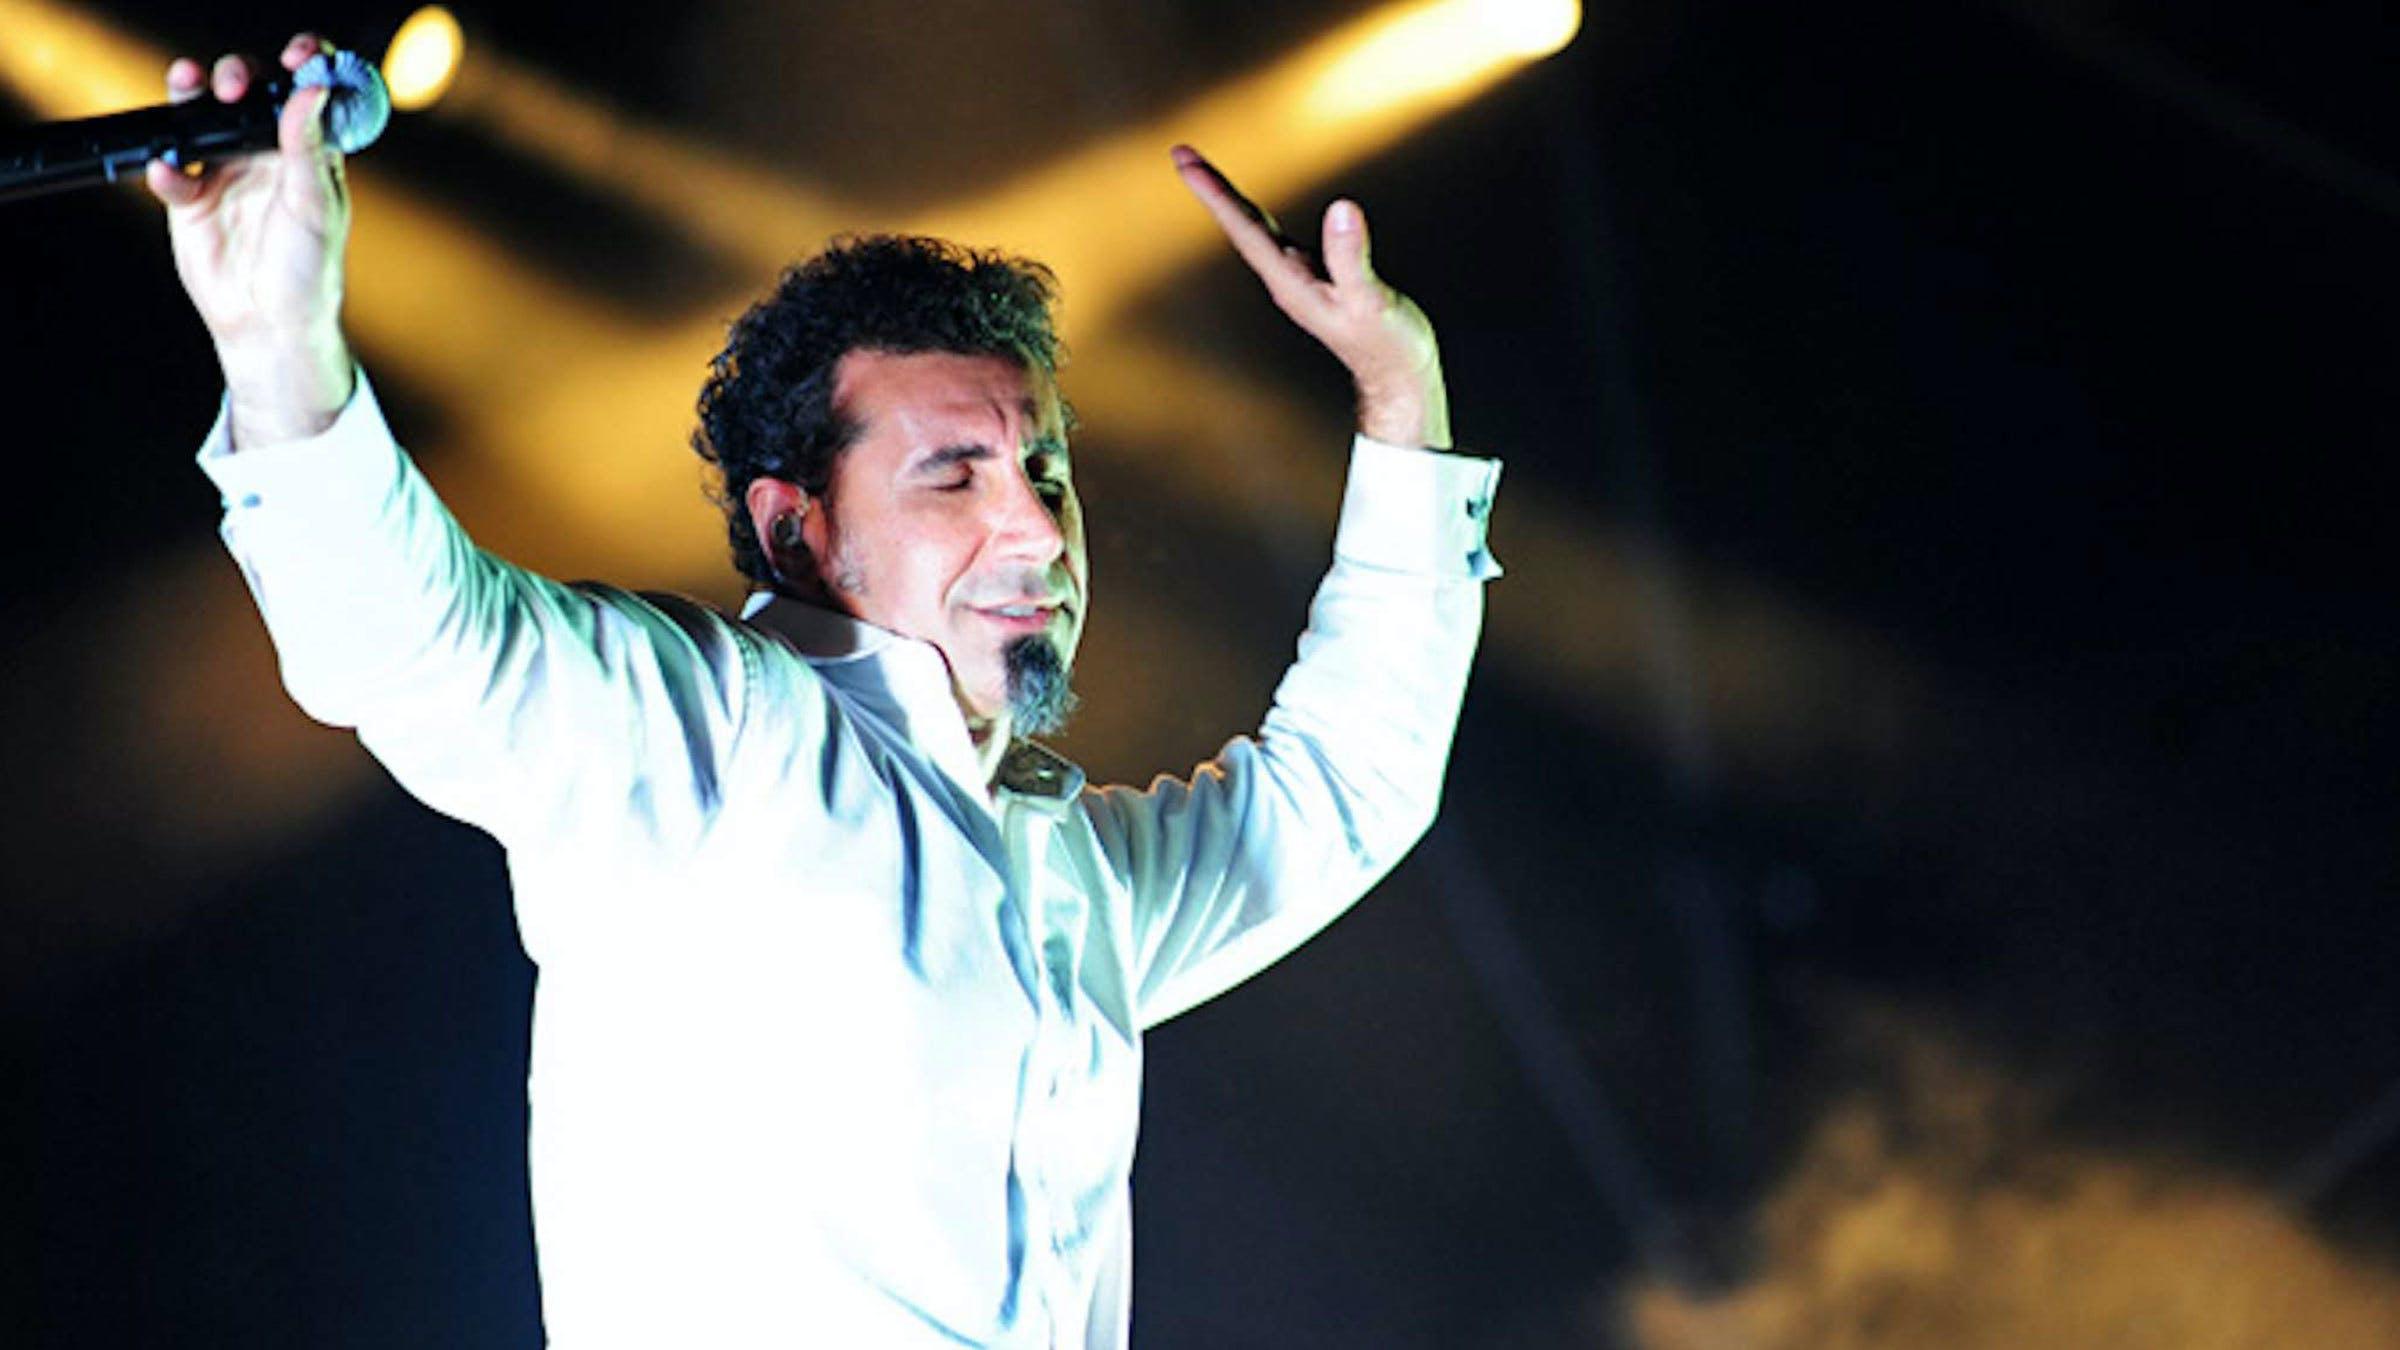 System Of A Down Frontman Serj Tankian Is Making A Documentary